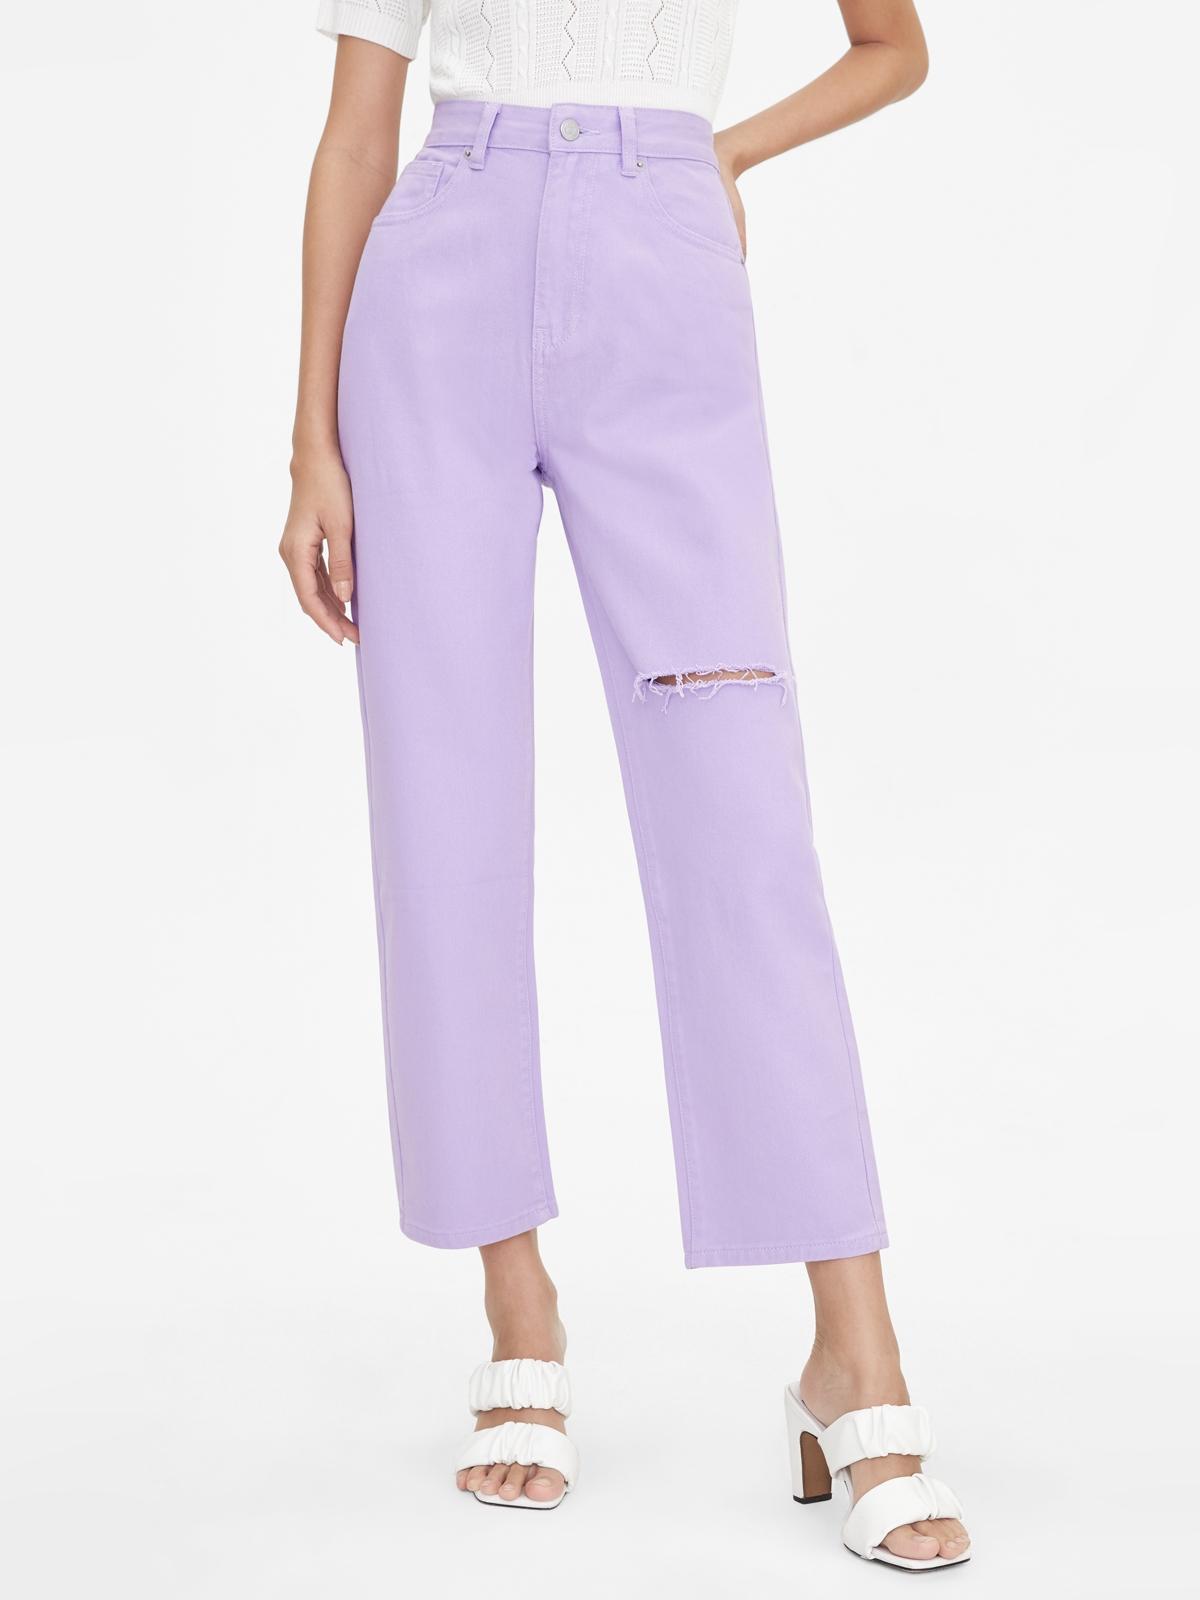 Single Ripped High Waist Denim Pants Purple